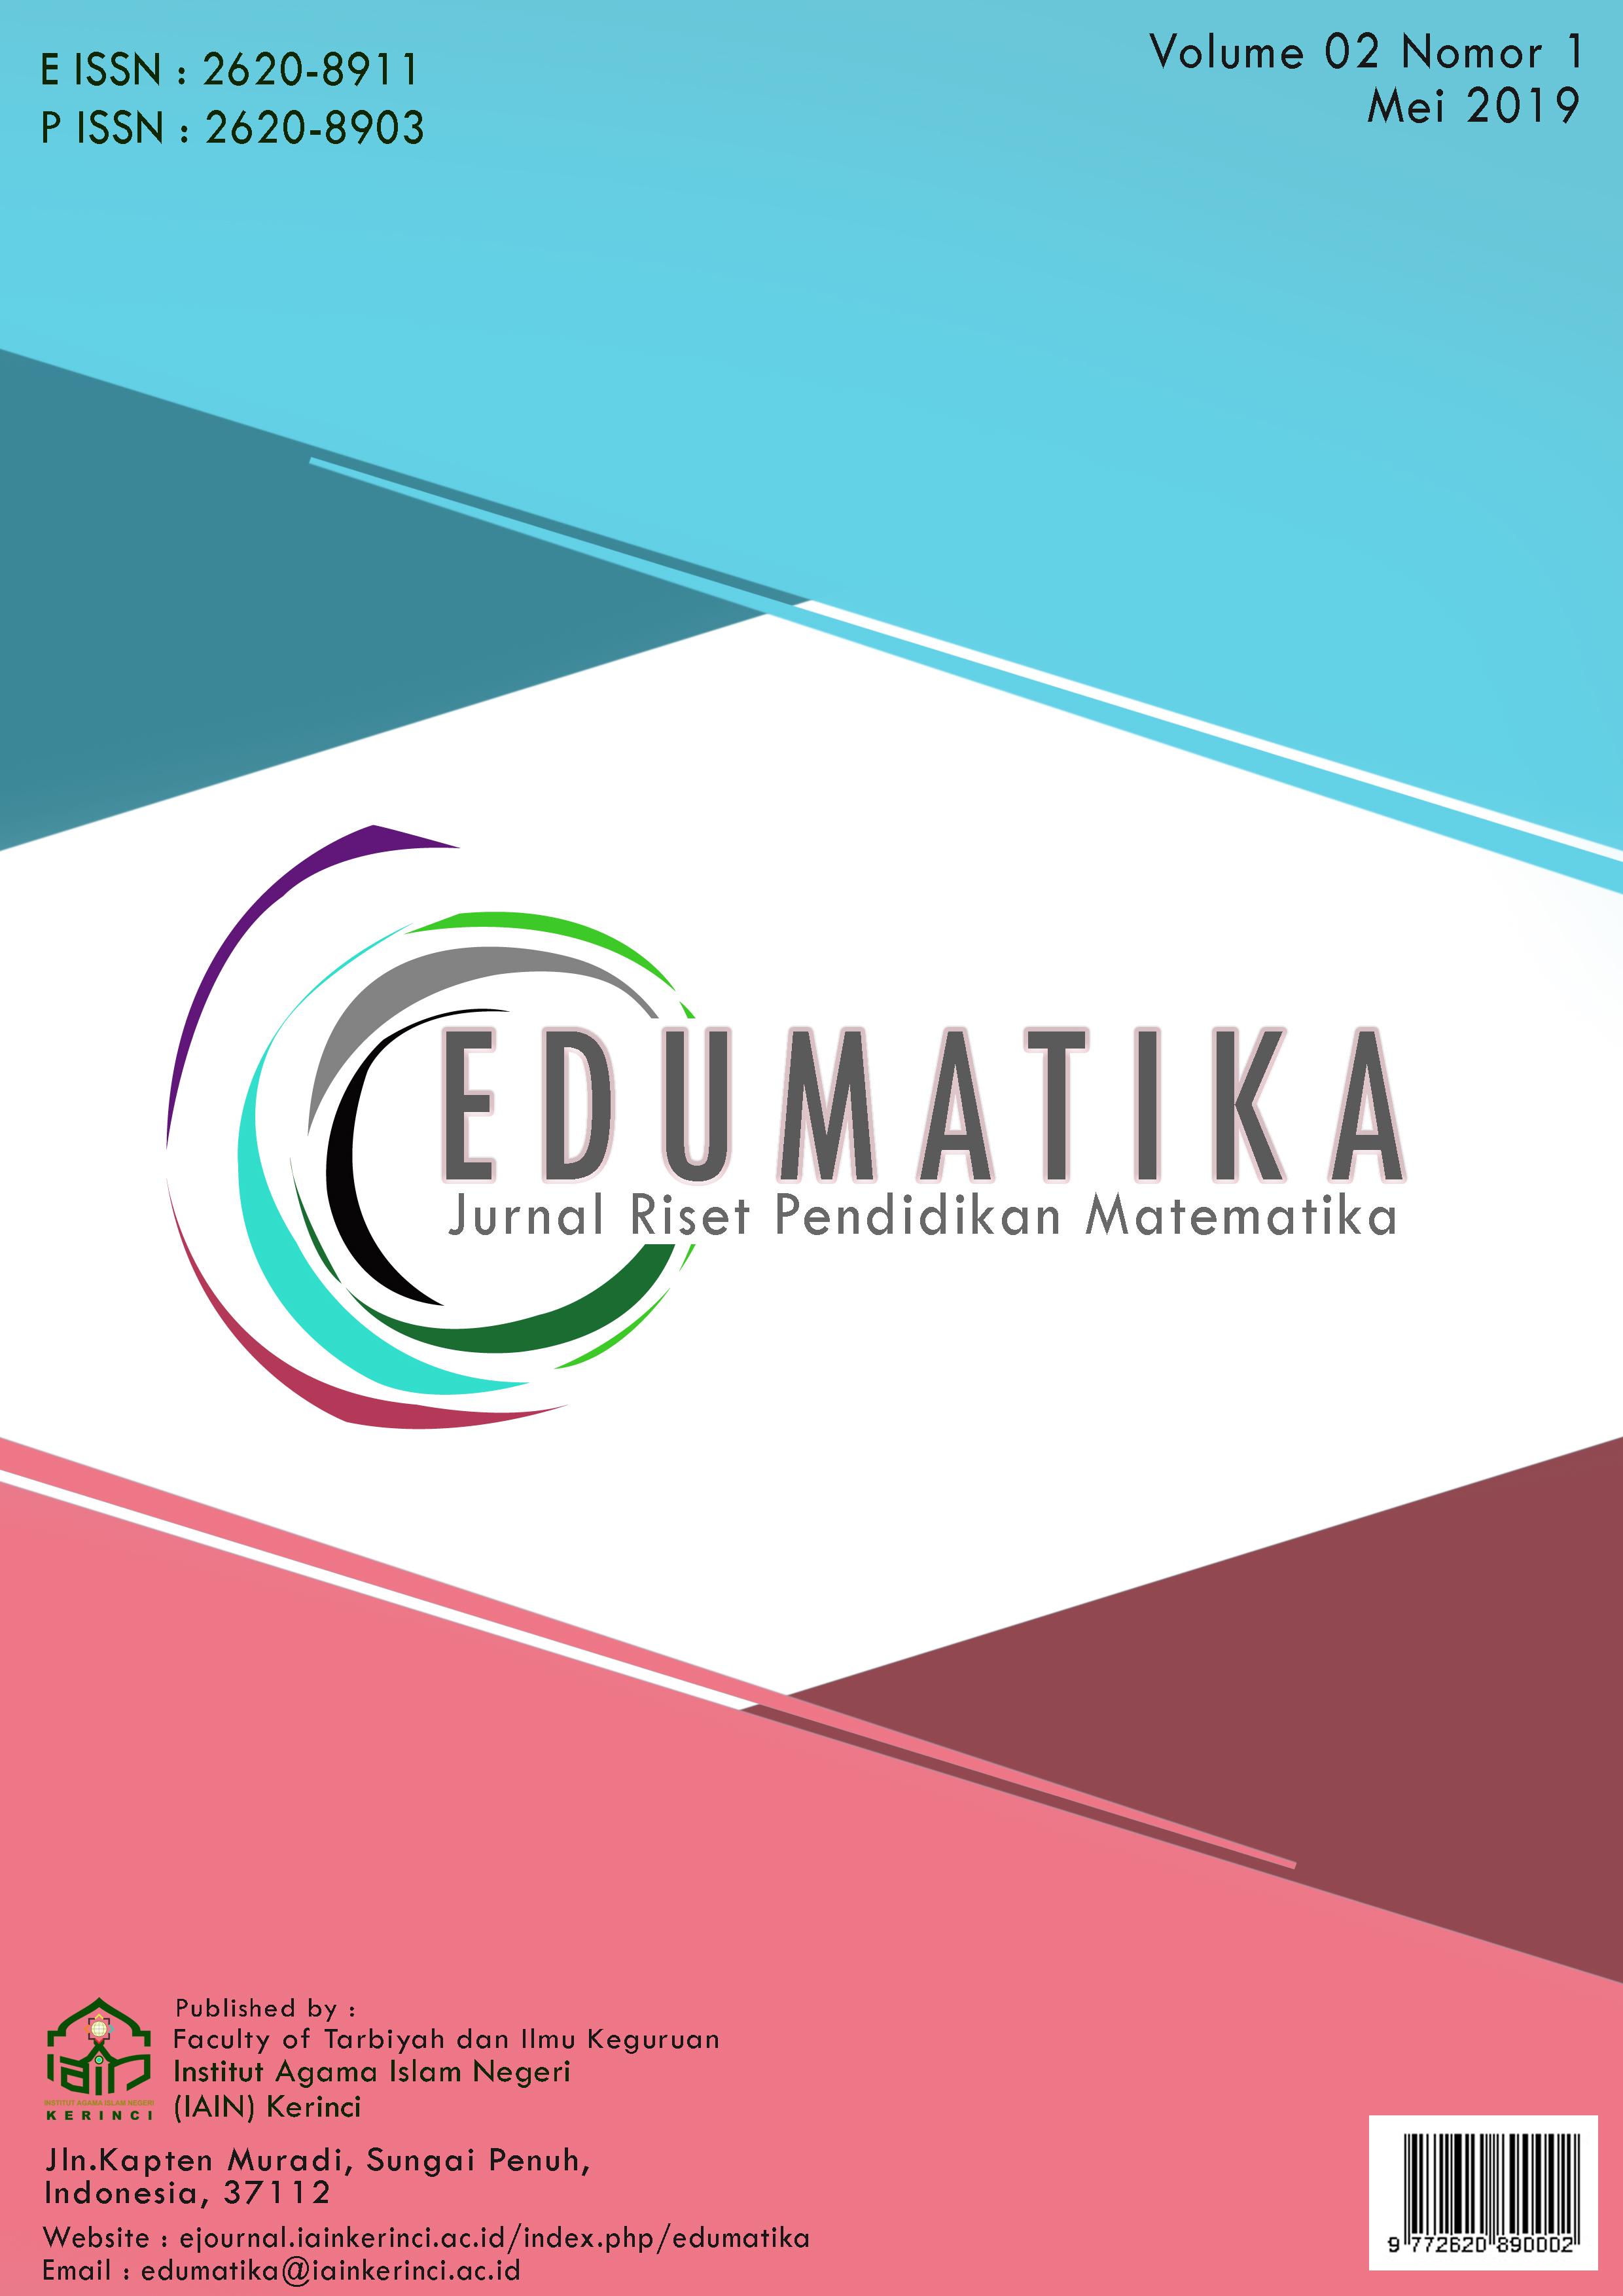 View Vol. 2 No. 1 (2019): Mei 2019, Edumatika : Jurnal Riset Pendidikan Matematika